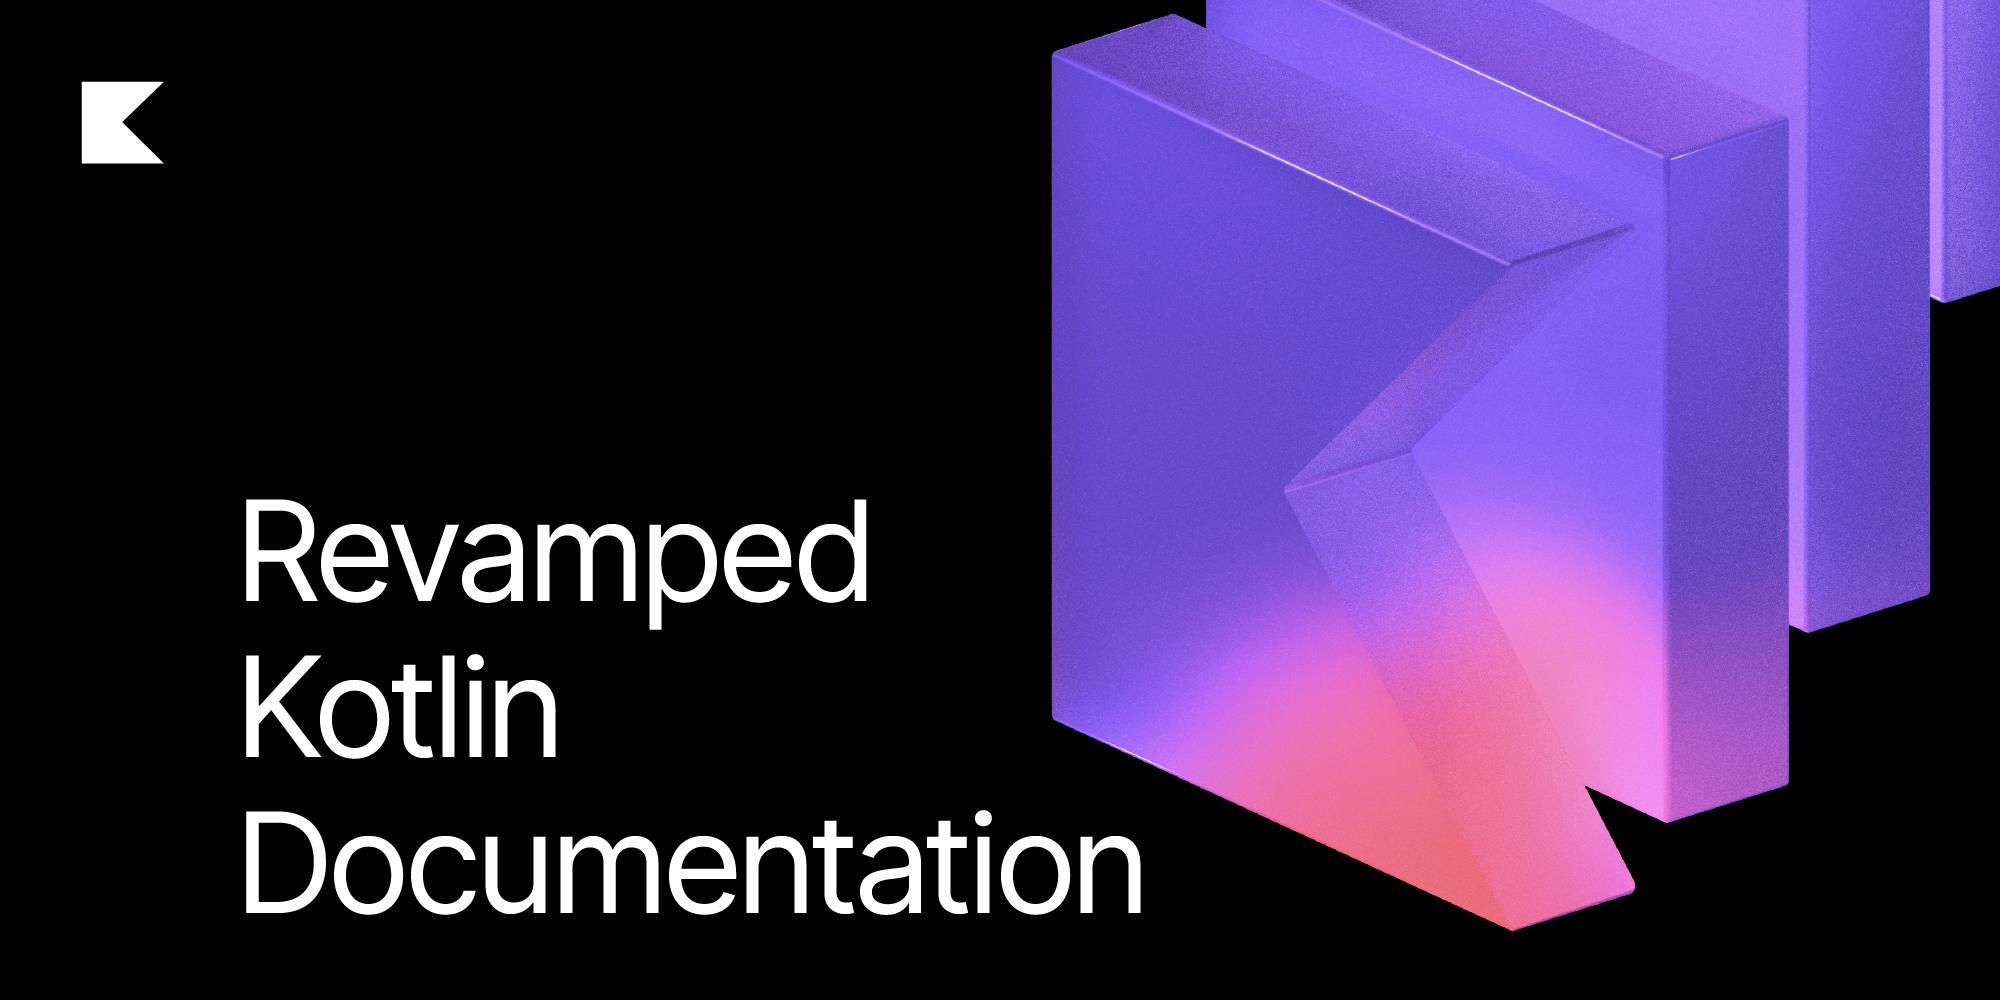 Kotlin revamped documentation